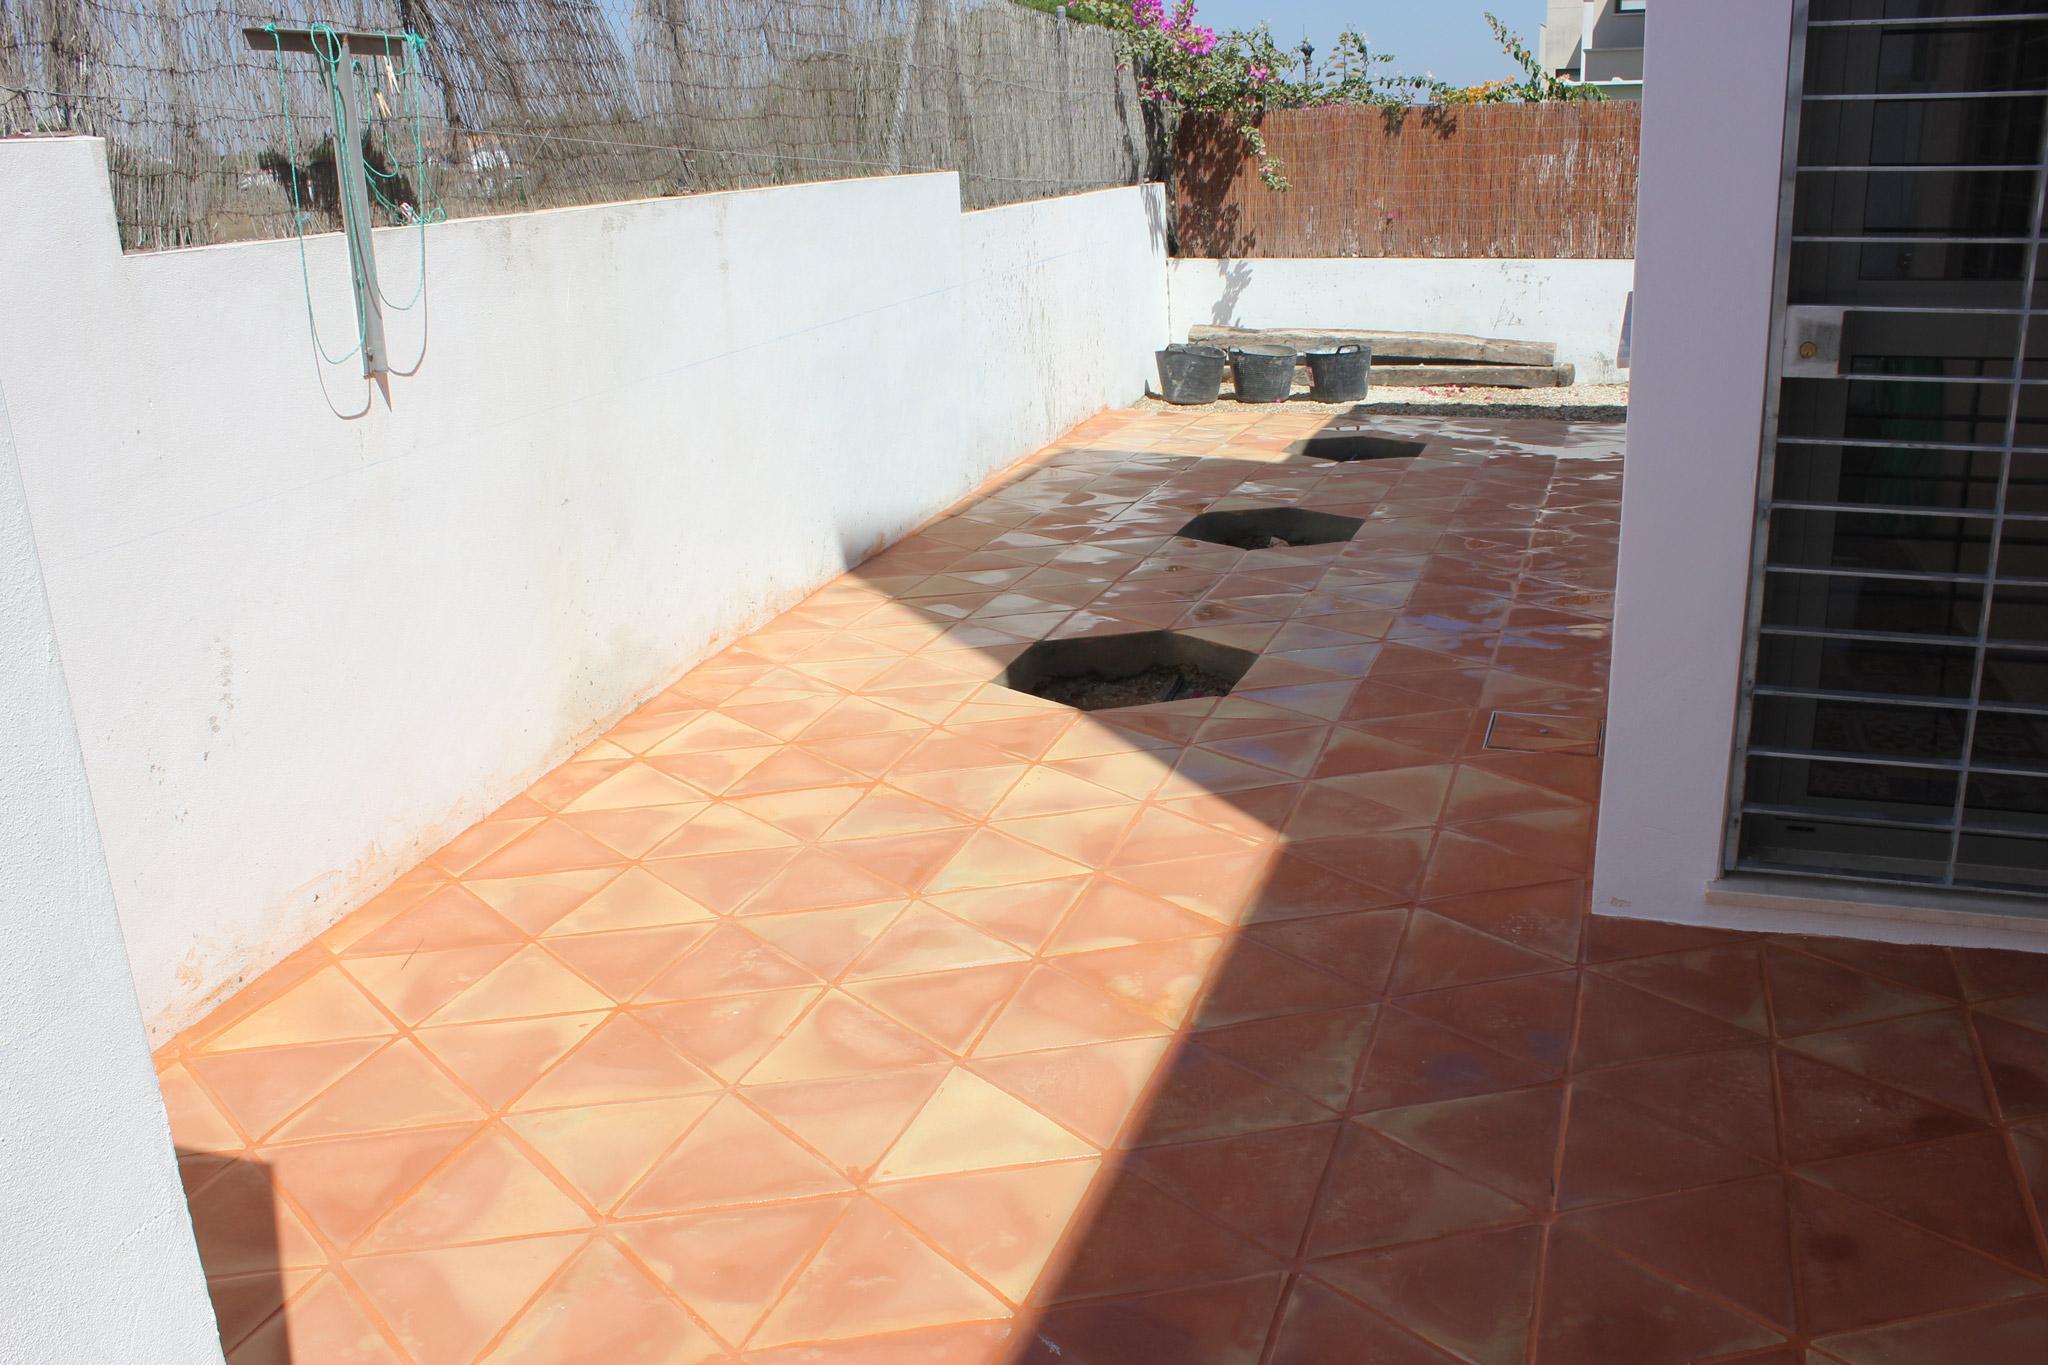 Clay Tiles Karachi Terracotta Floor Tiles in Multan Pakistan (5)